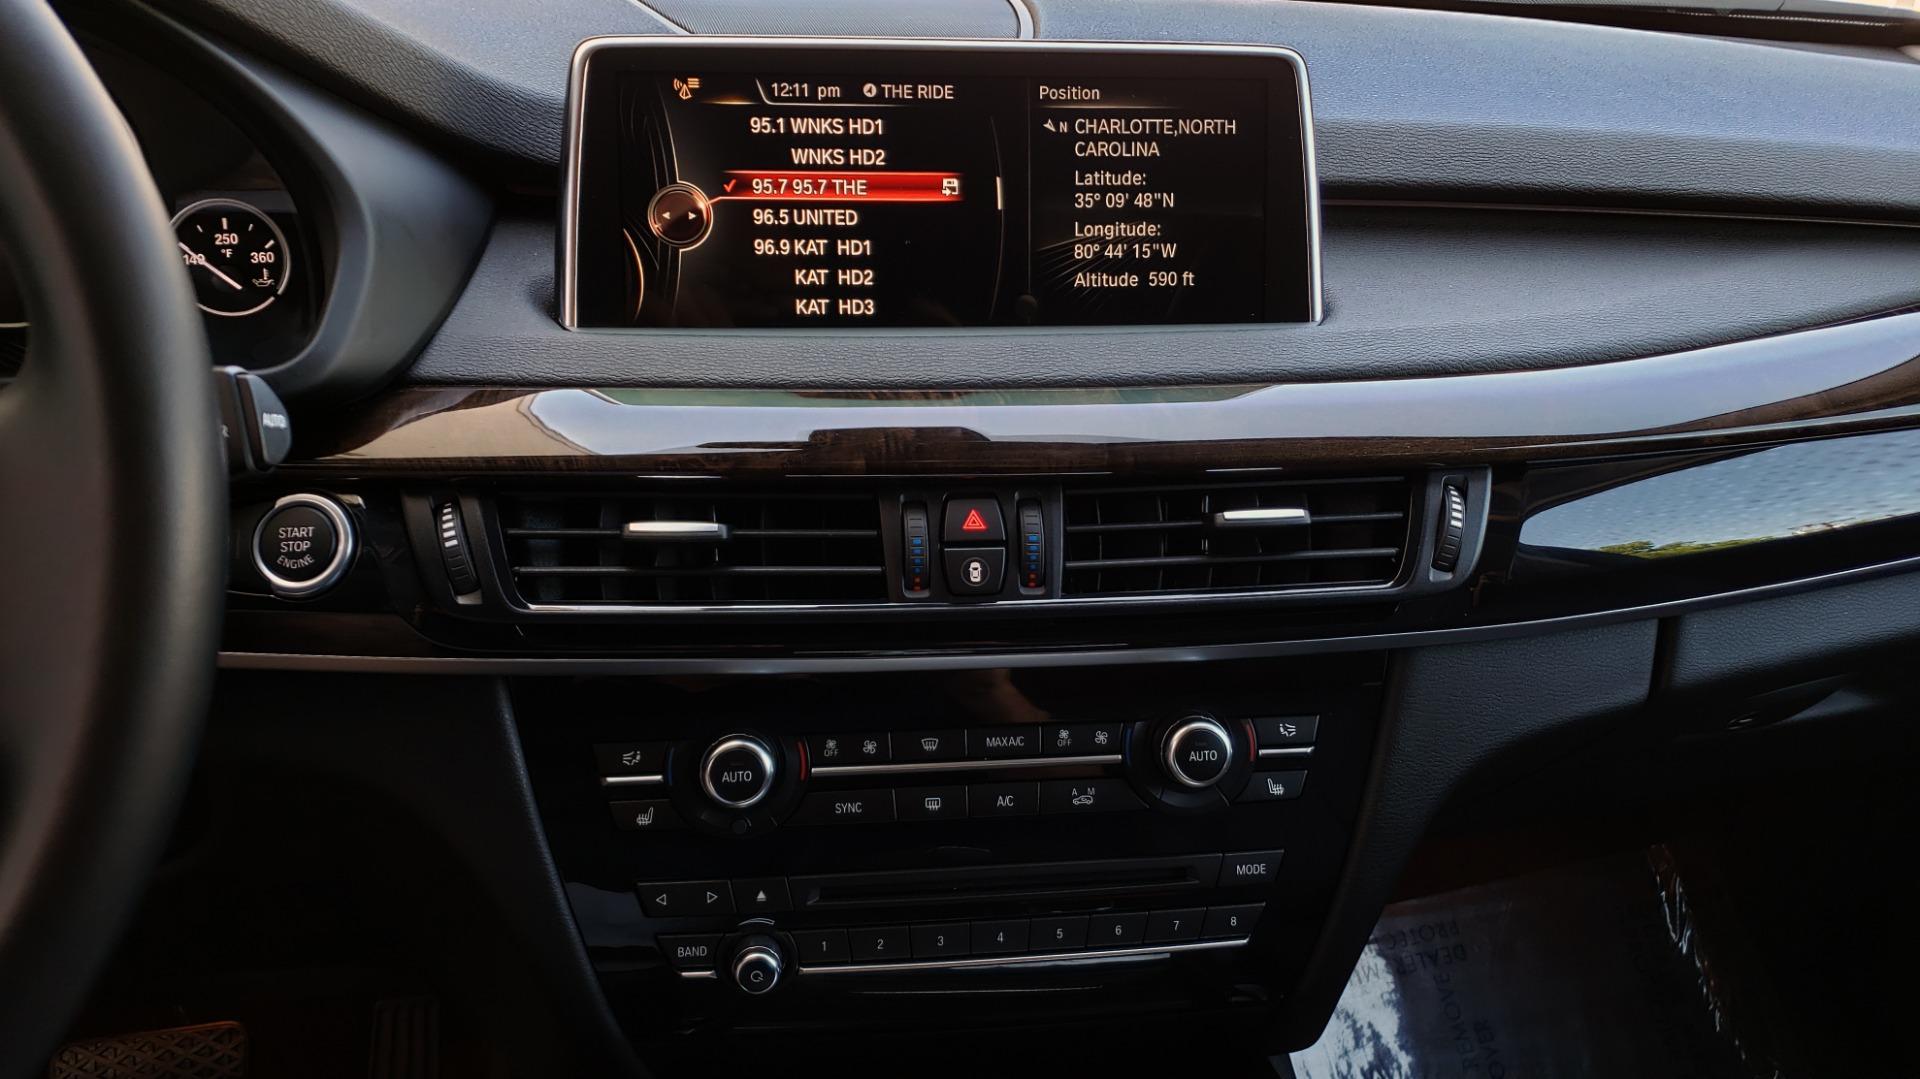 Used 2016 BMW X5 XDRIVE35I / PREM PKG / NAV / DRVR ASST PLUS / REARVIEW for sale $25,765 at Formula Imports in Charlotte NC 28227 30